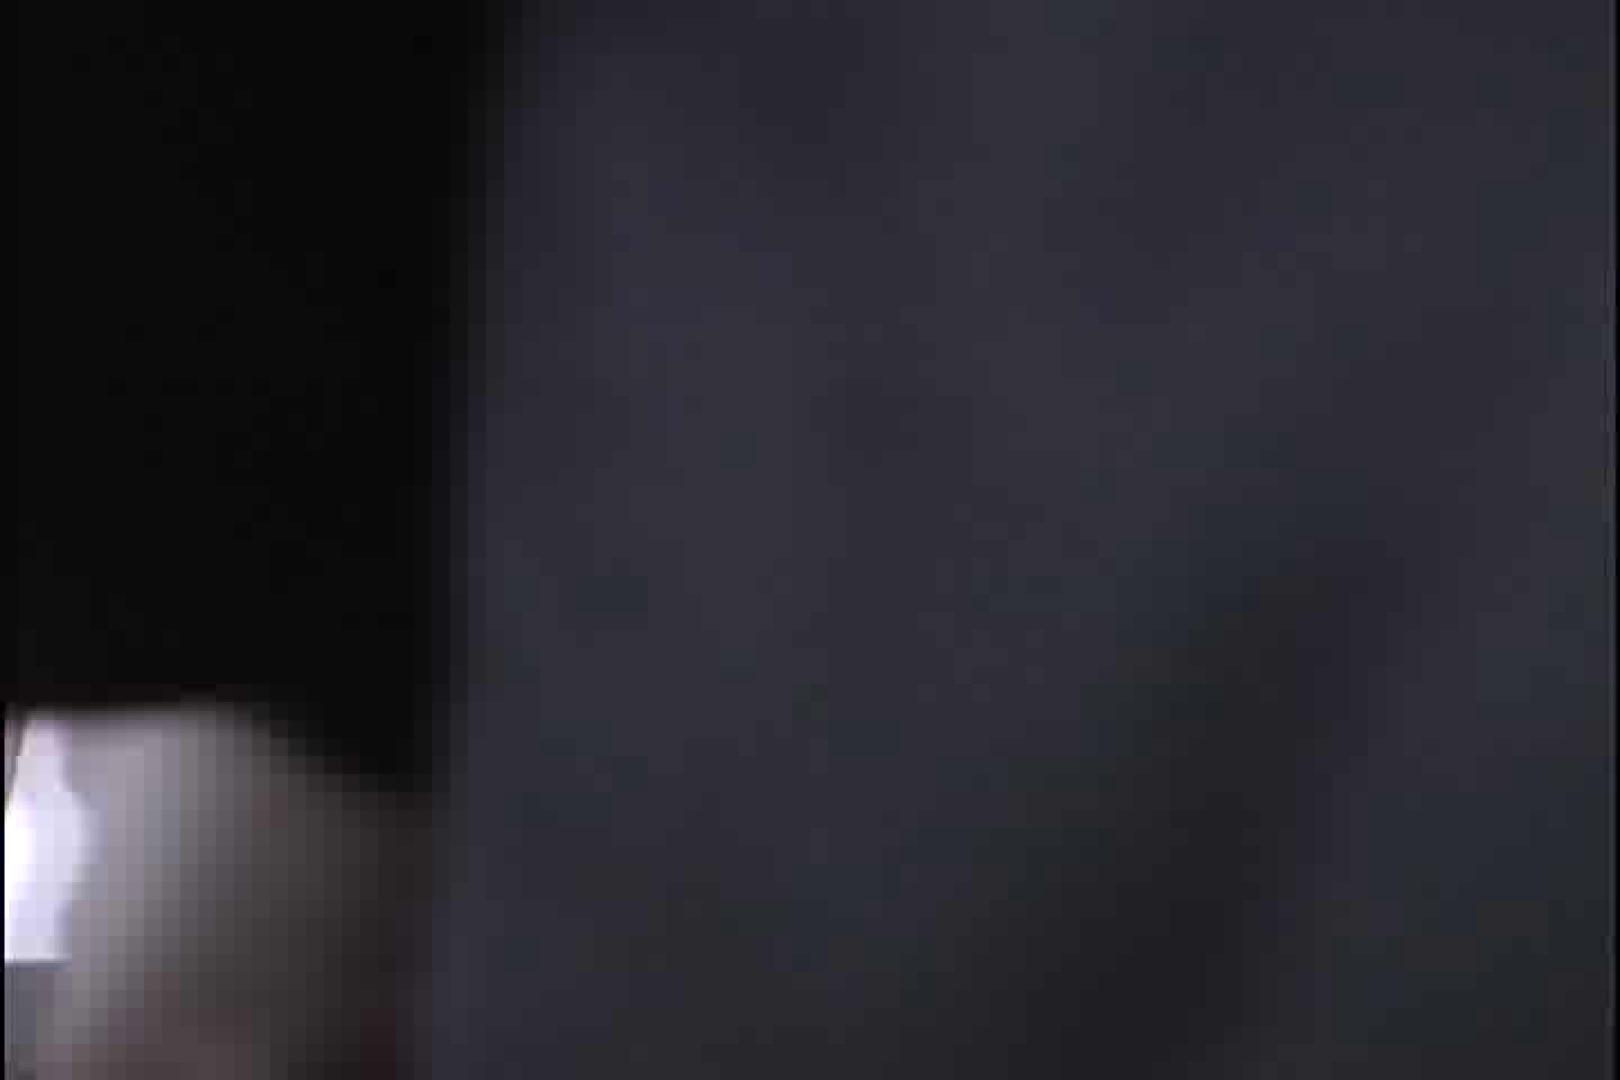 RQカメラ地獄Vol.10 チクビ SEX無修正画像 56画像 45